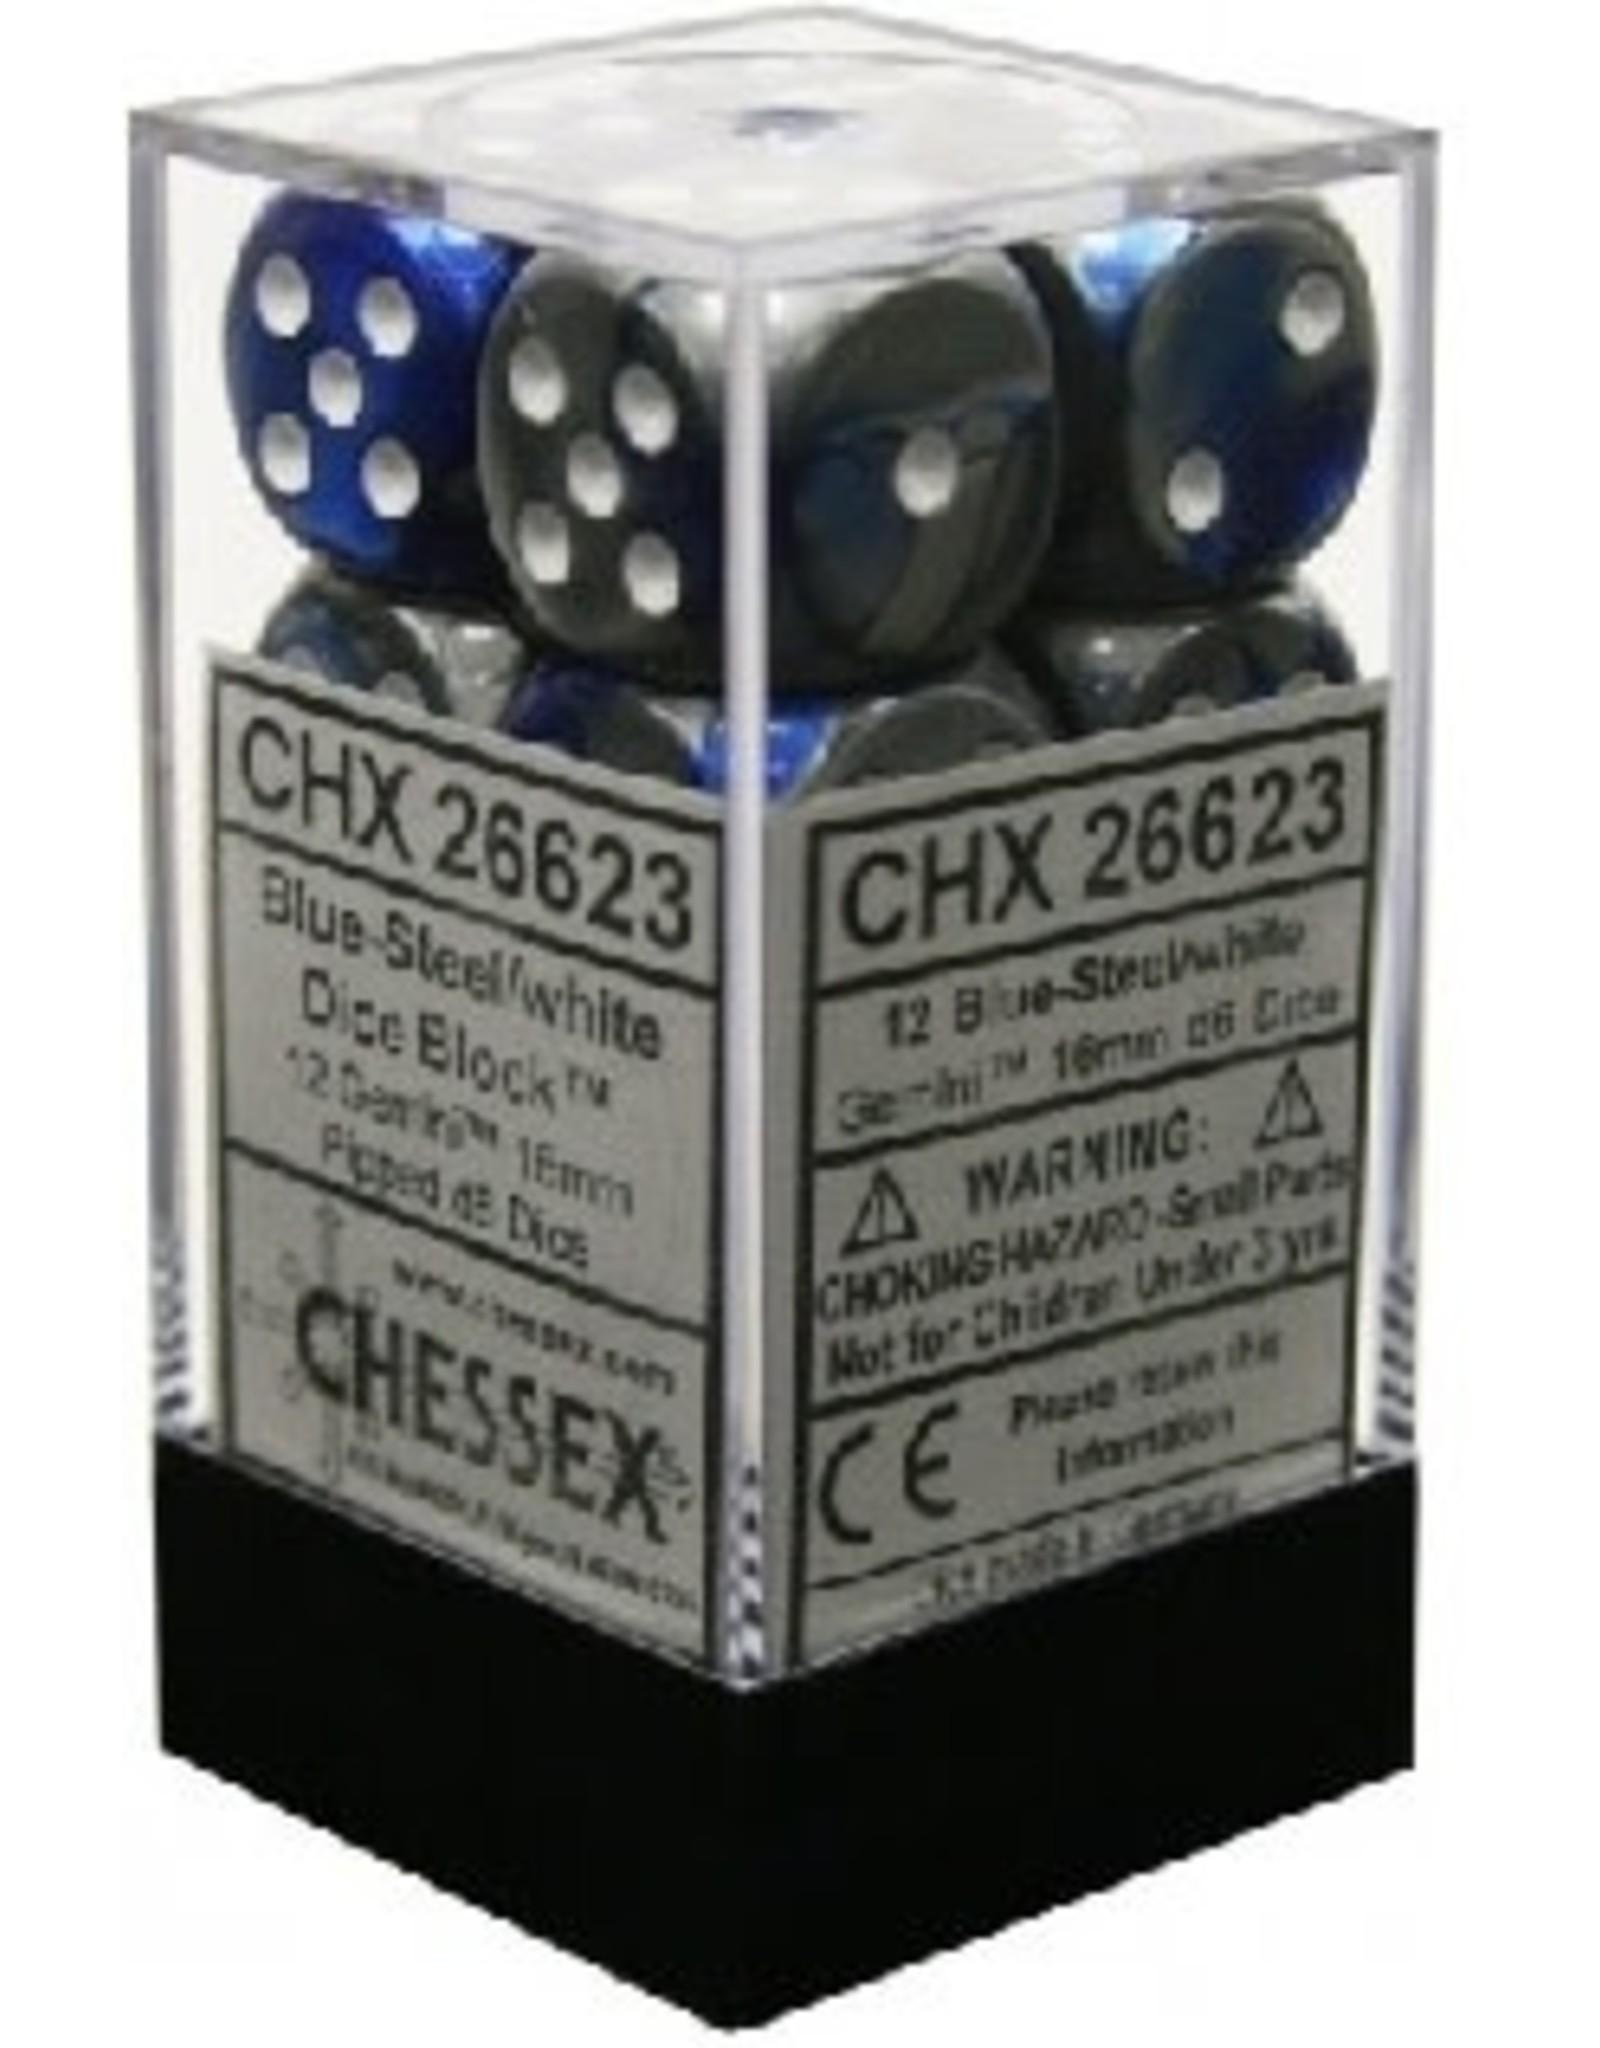 CHESSEX GEMINI 12D6 BLUE-STEEL/WHITE 16MM